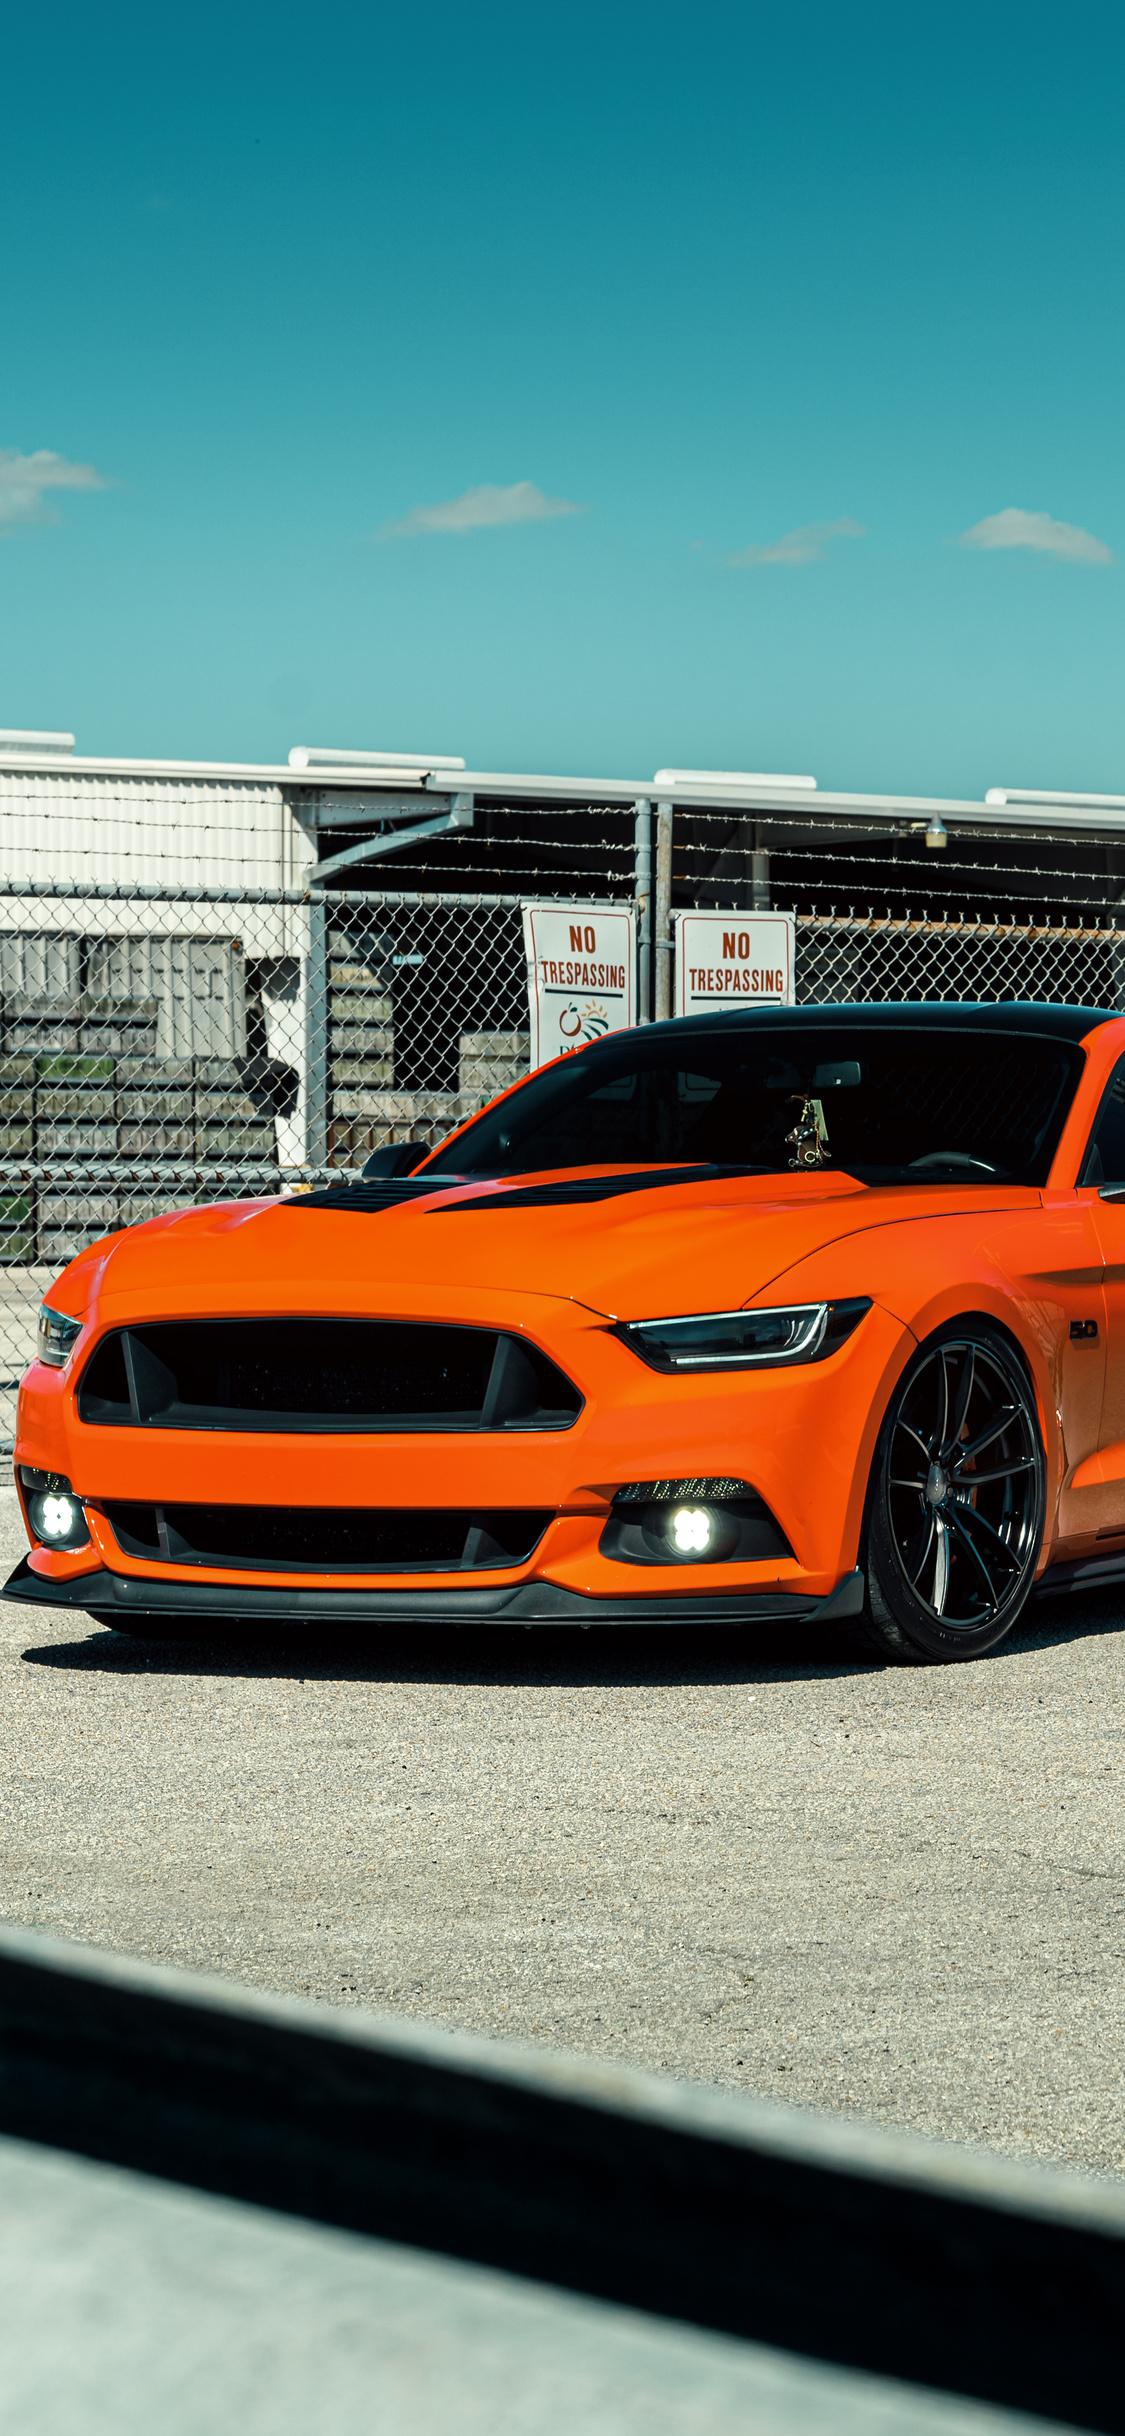 velgen-wheels-orange-mustang-8k-tn.jpg